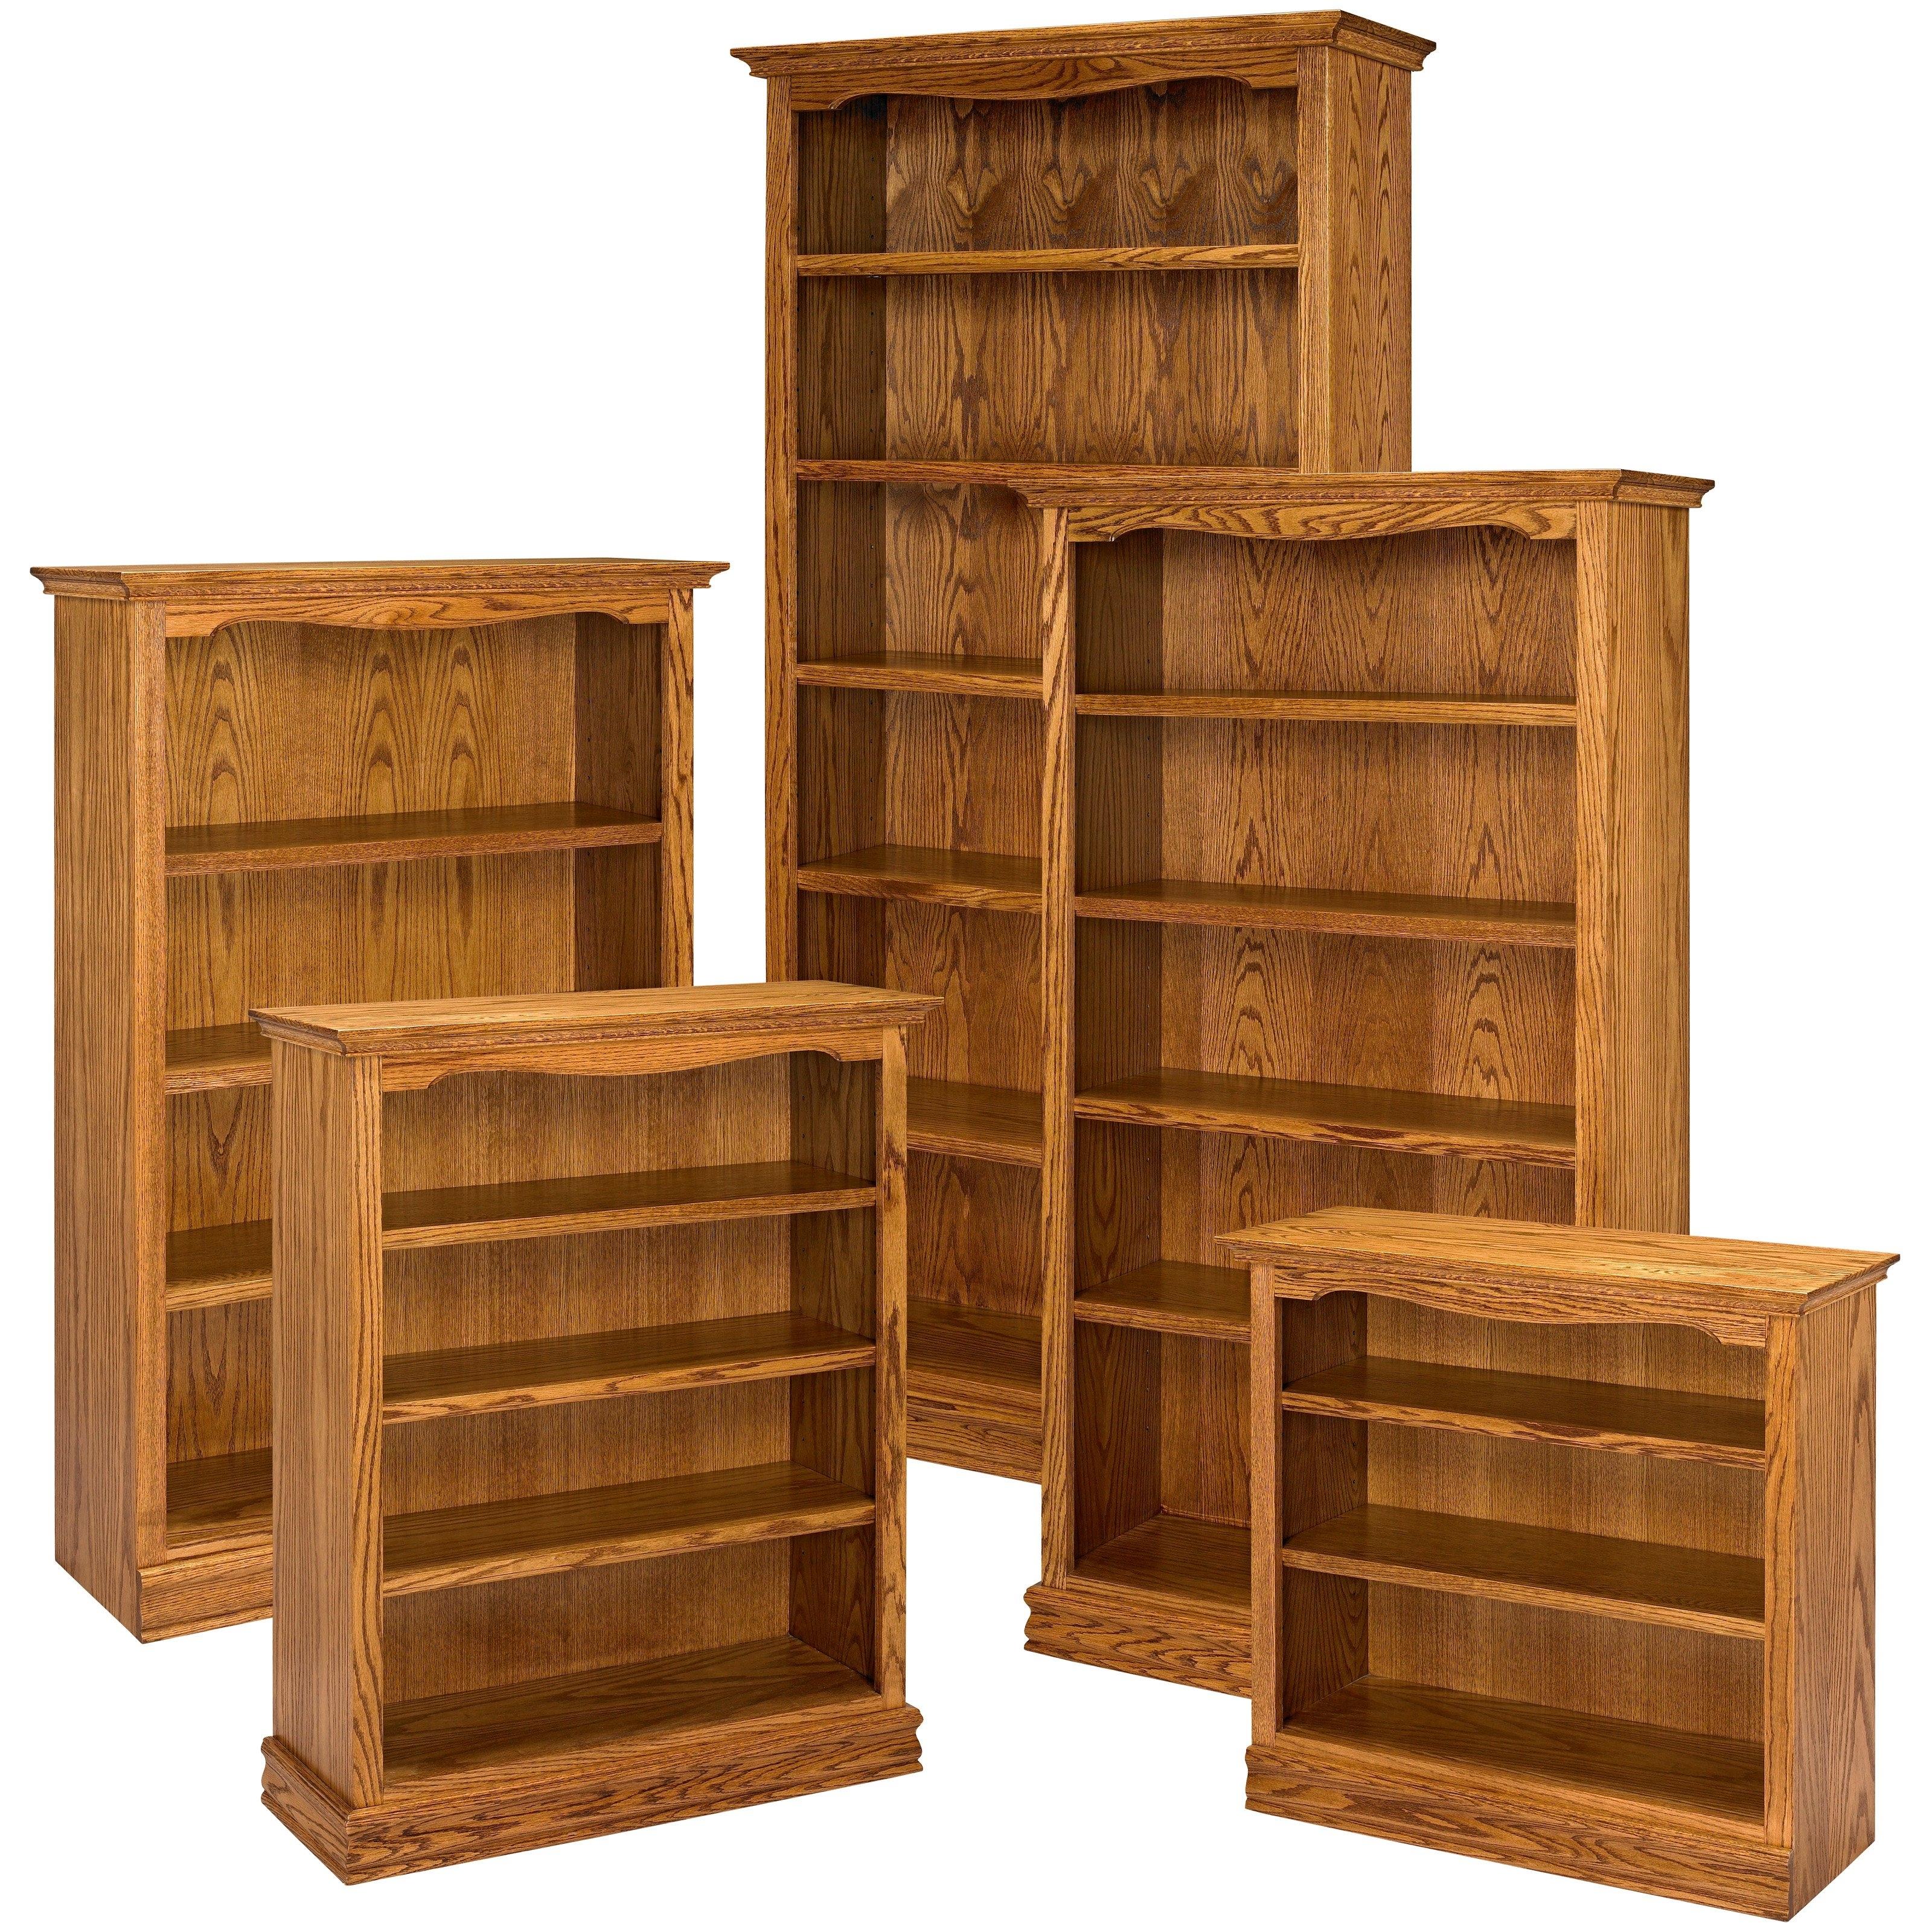 A & E Solid Oak Americana Wood Bookcase (View 6 of 15)